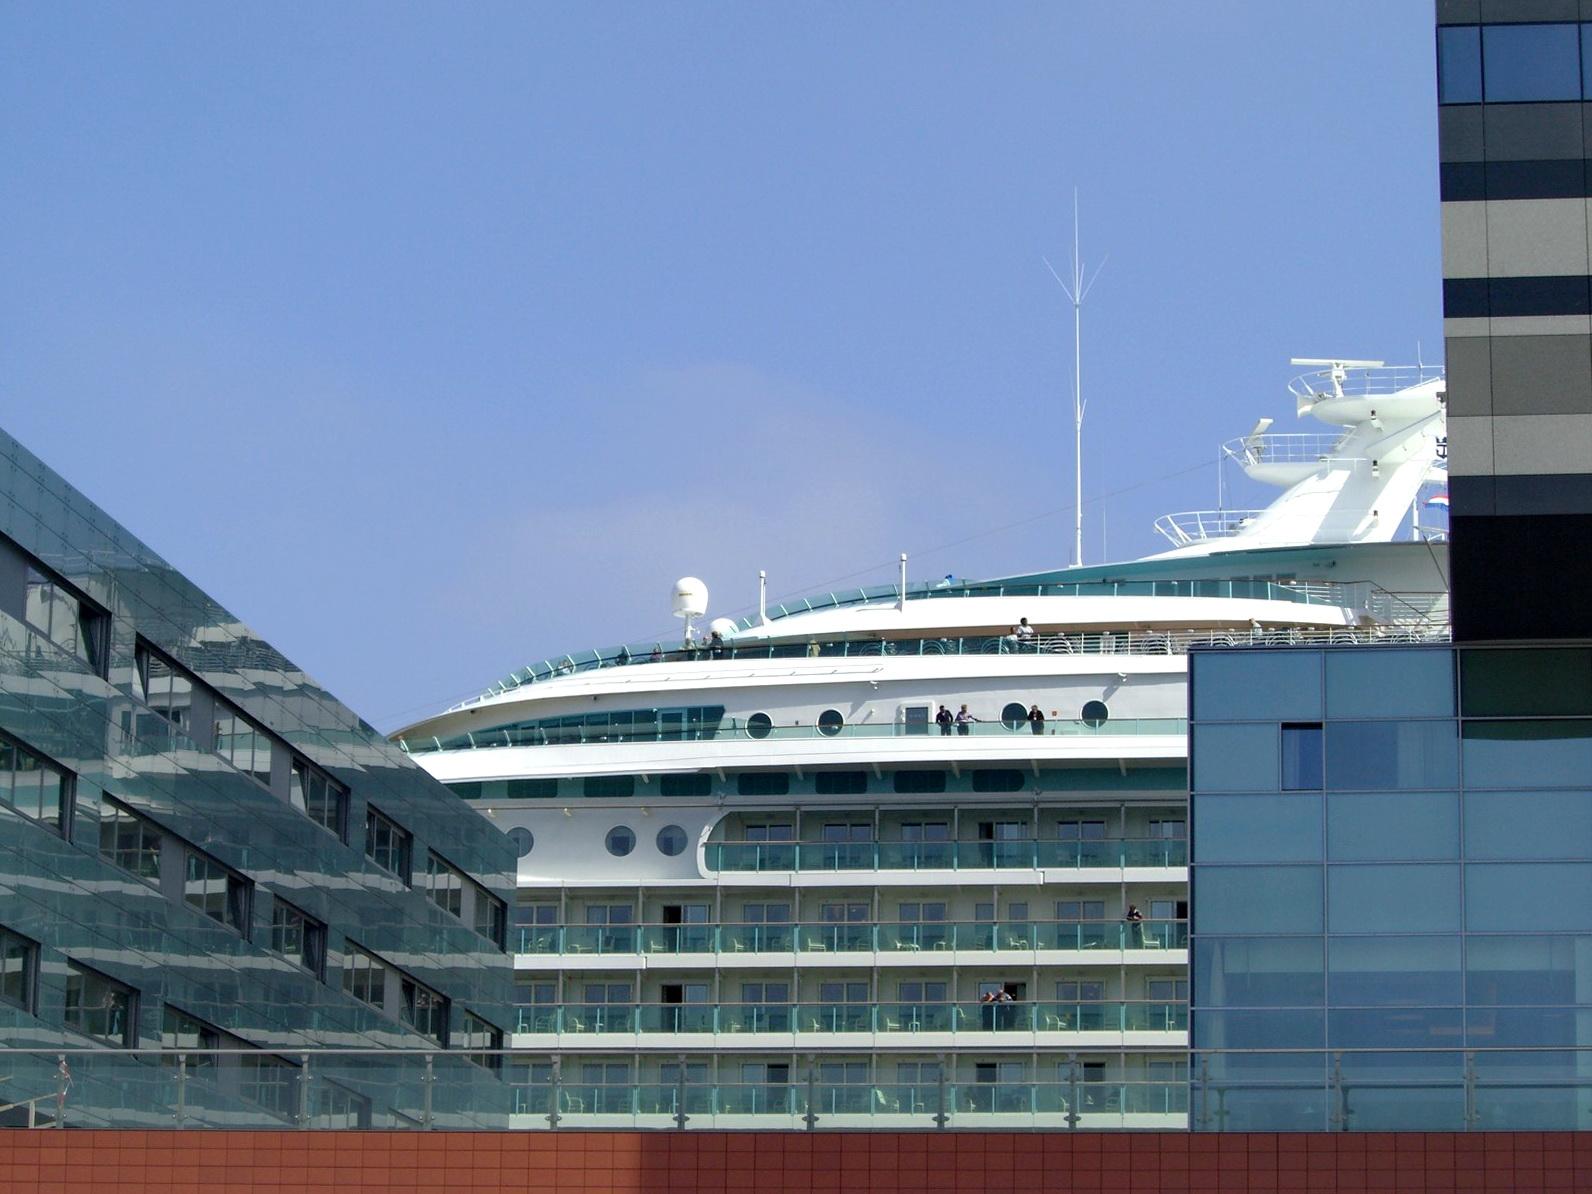 FileAmsterdam Passenger Terminal Cruise Ship Navigator Of The Seas 09.jpg - Wikimedia Commons